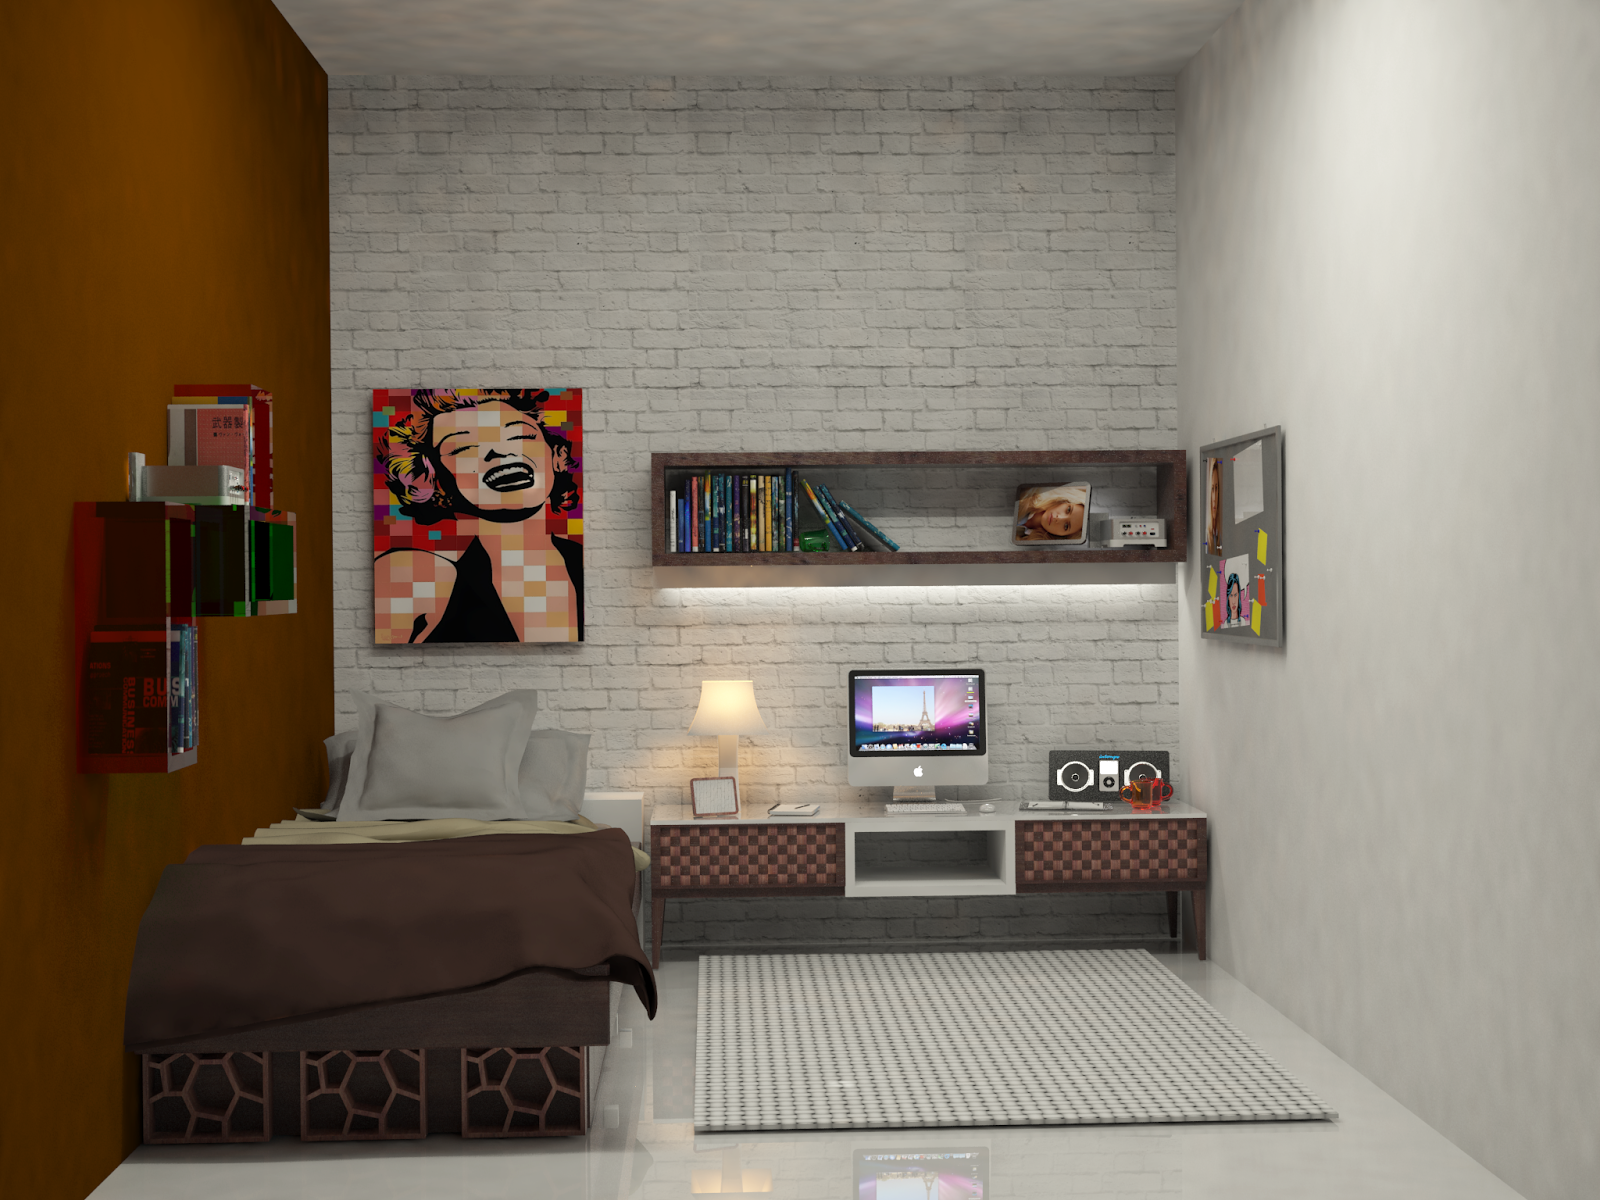 desain kamar kost rapi biaya murah | projects to try | room, cool